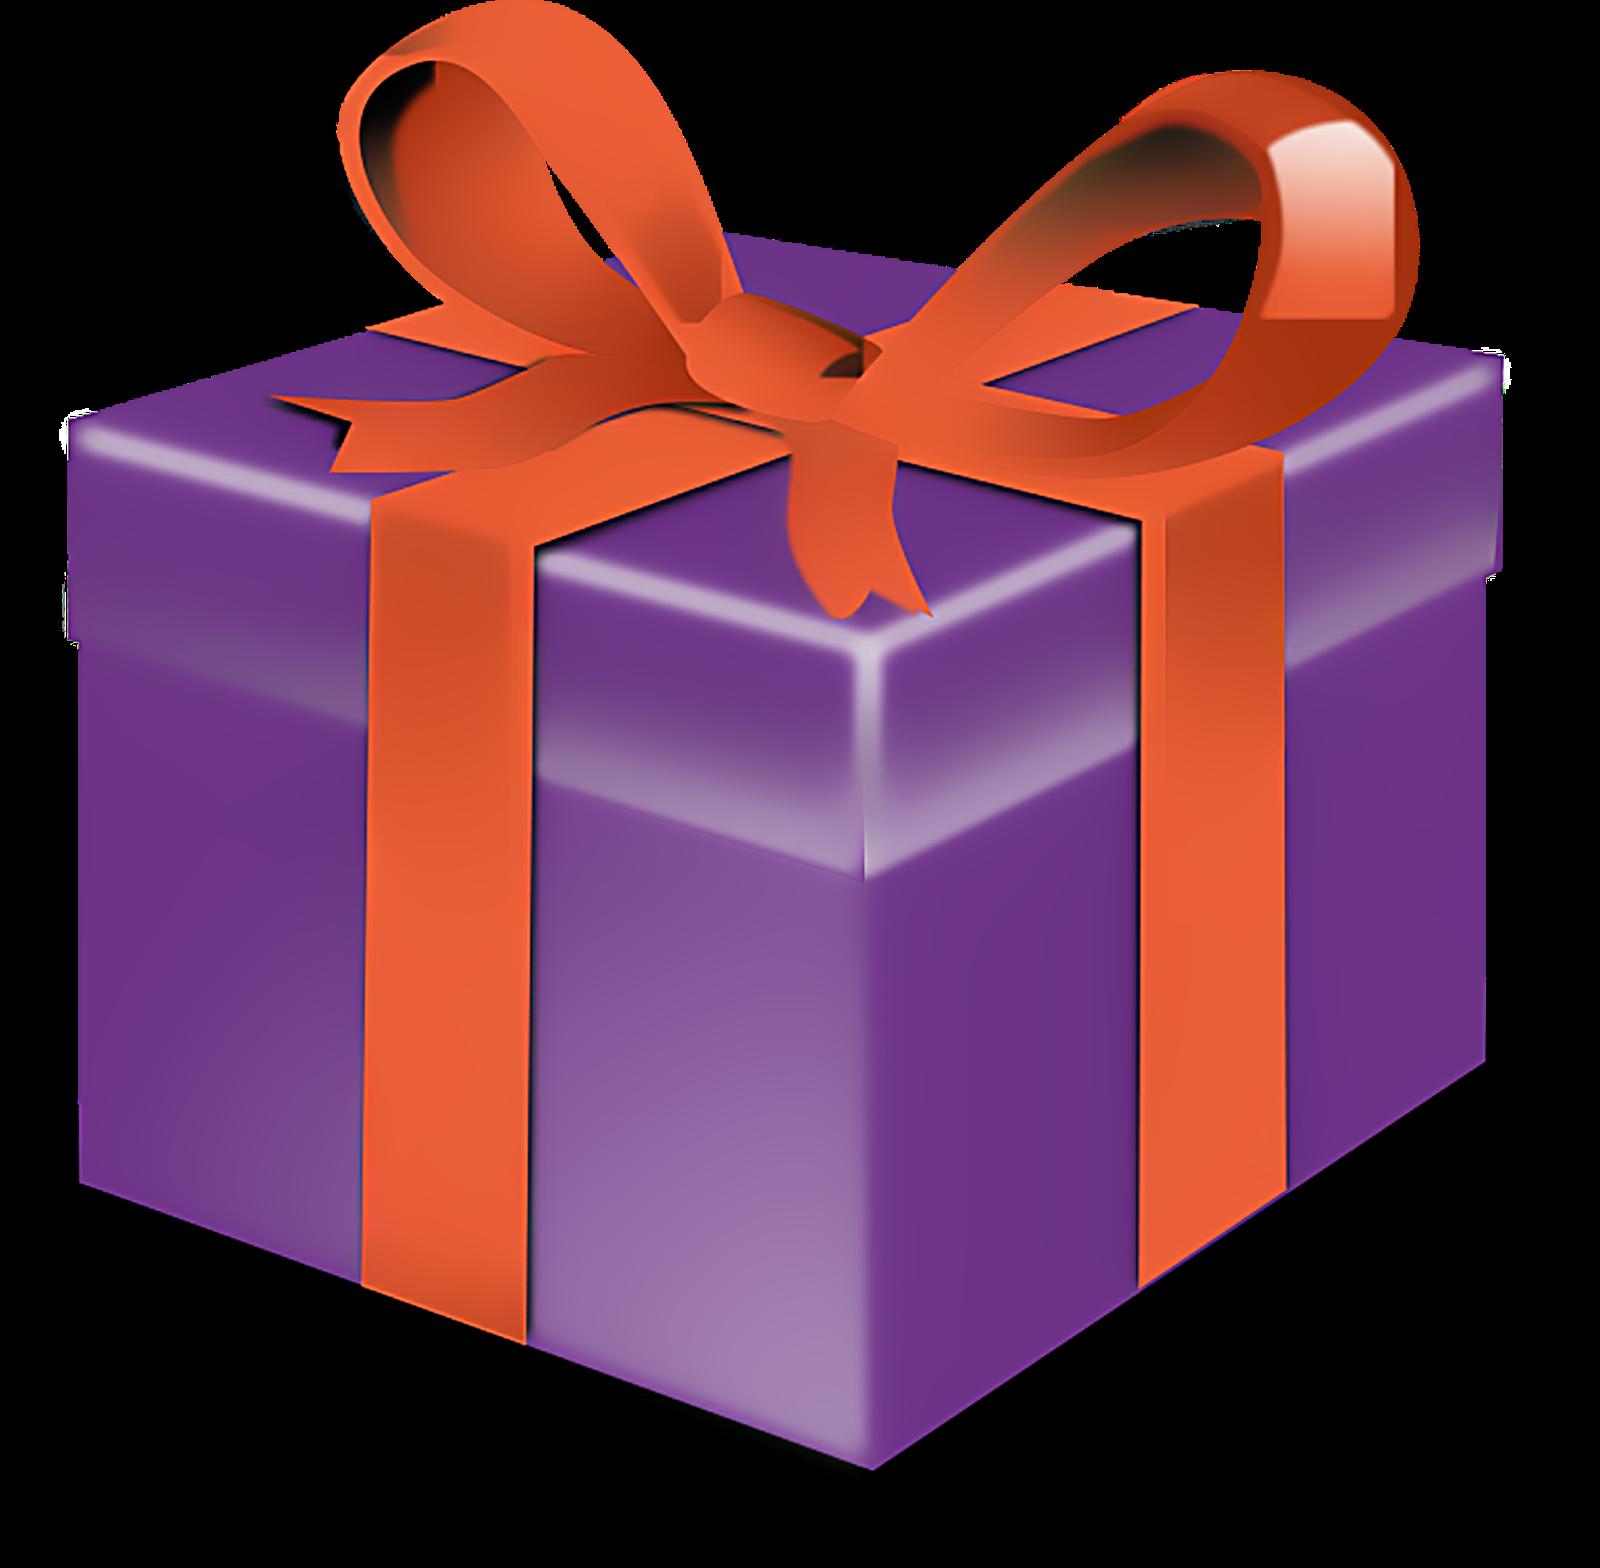 Present at getdrawings com. Lunchbox clipart tool box